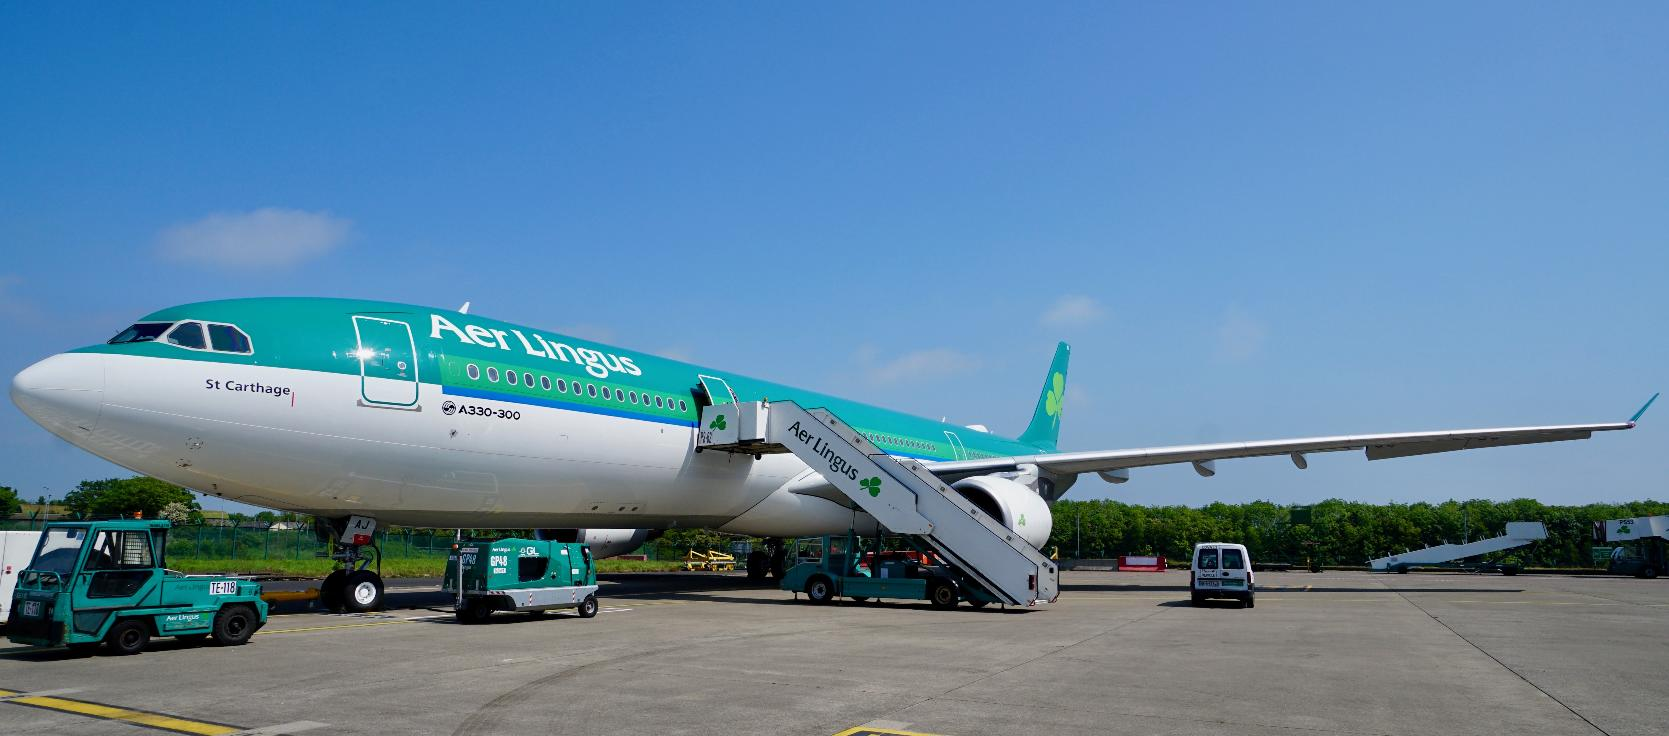 Aer Lingus accueille son nouvel Airbus A330-300